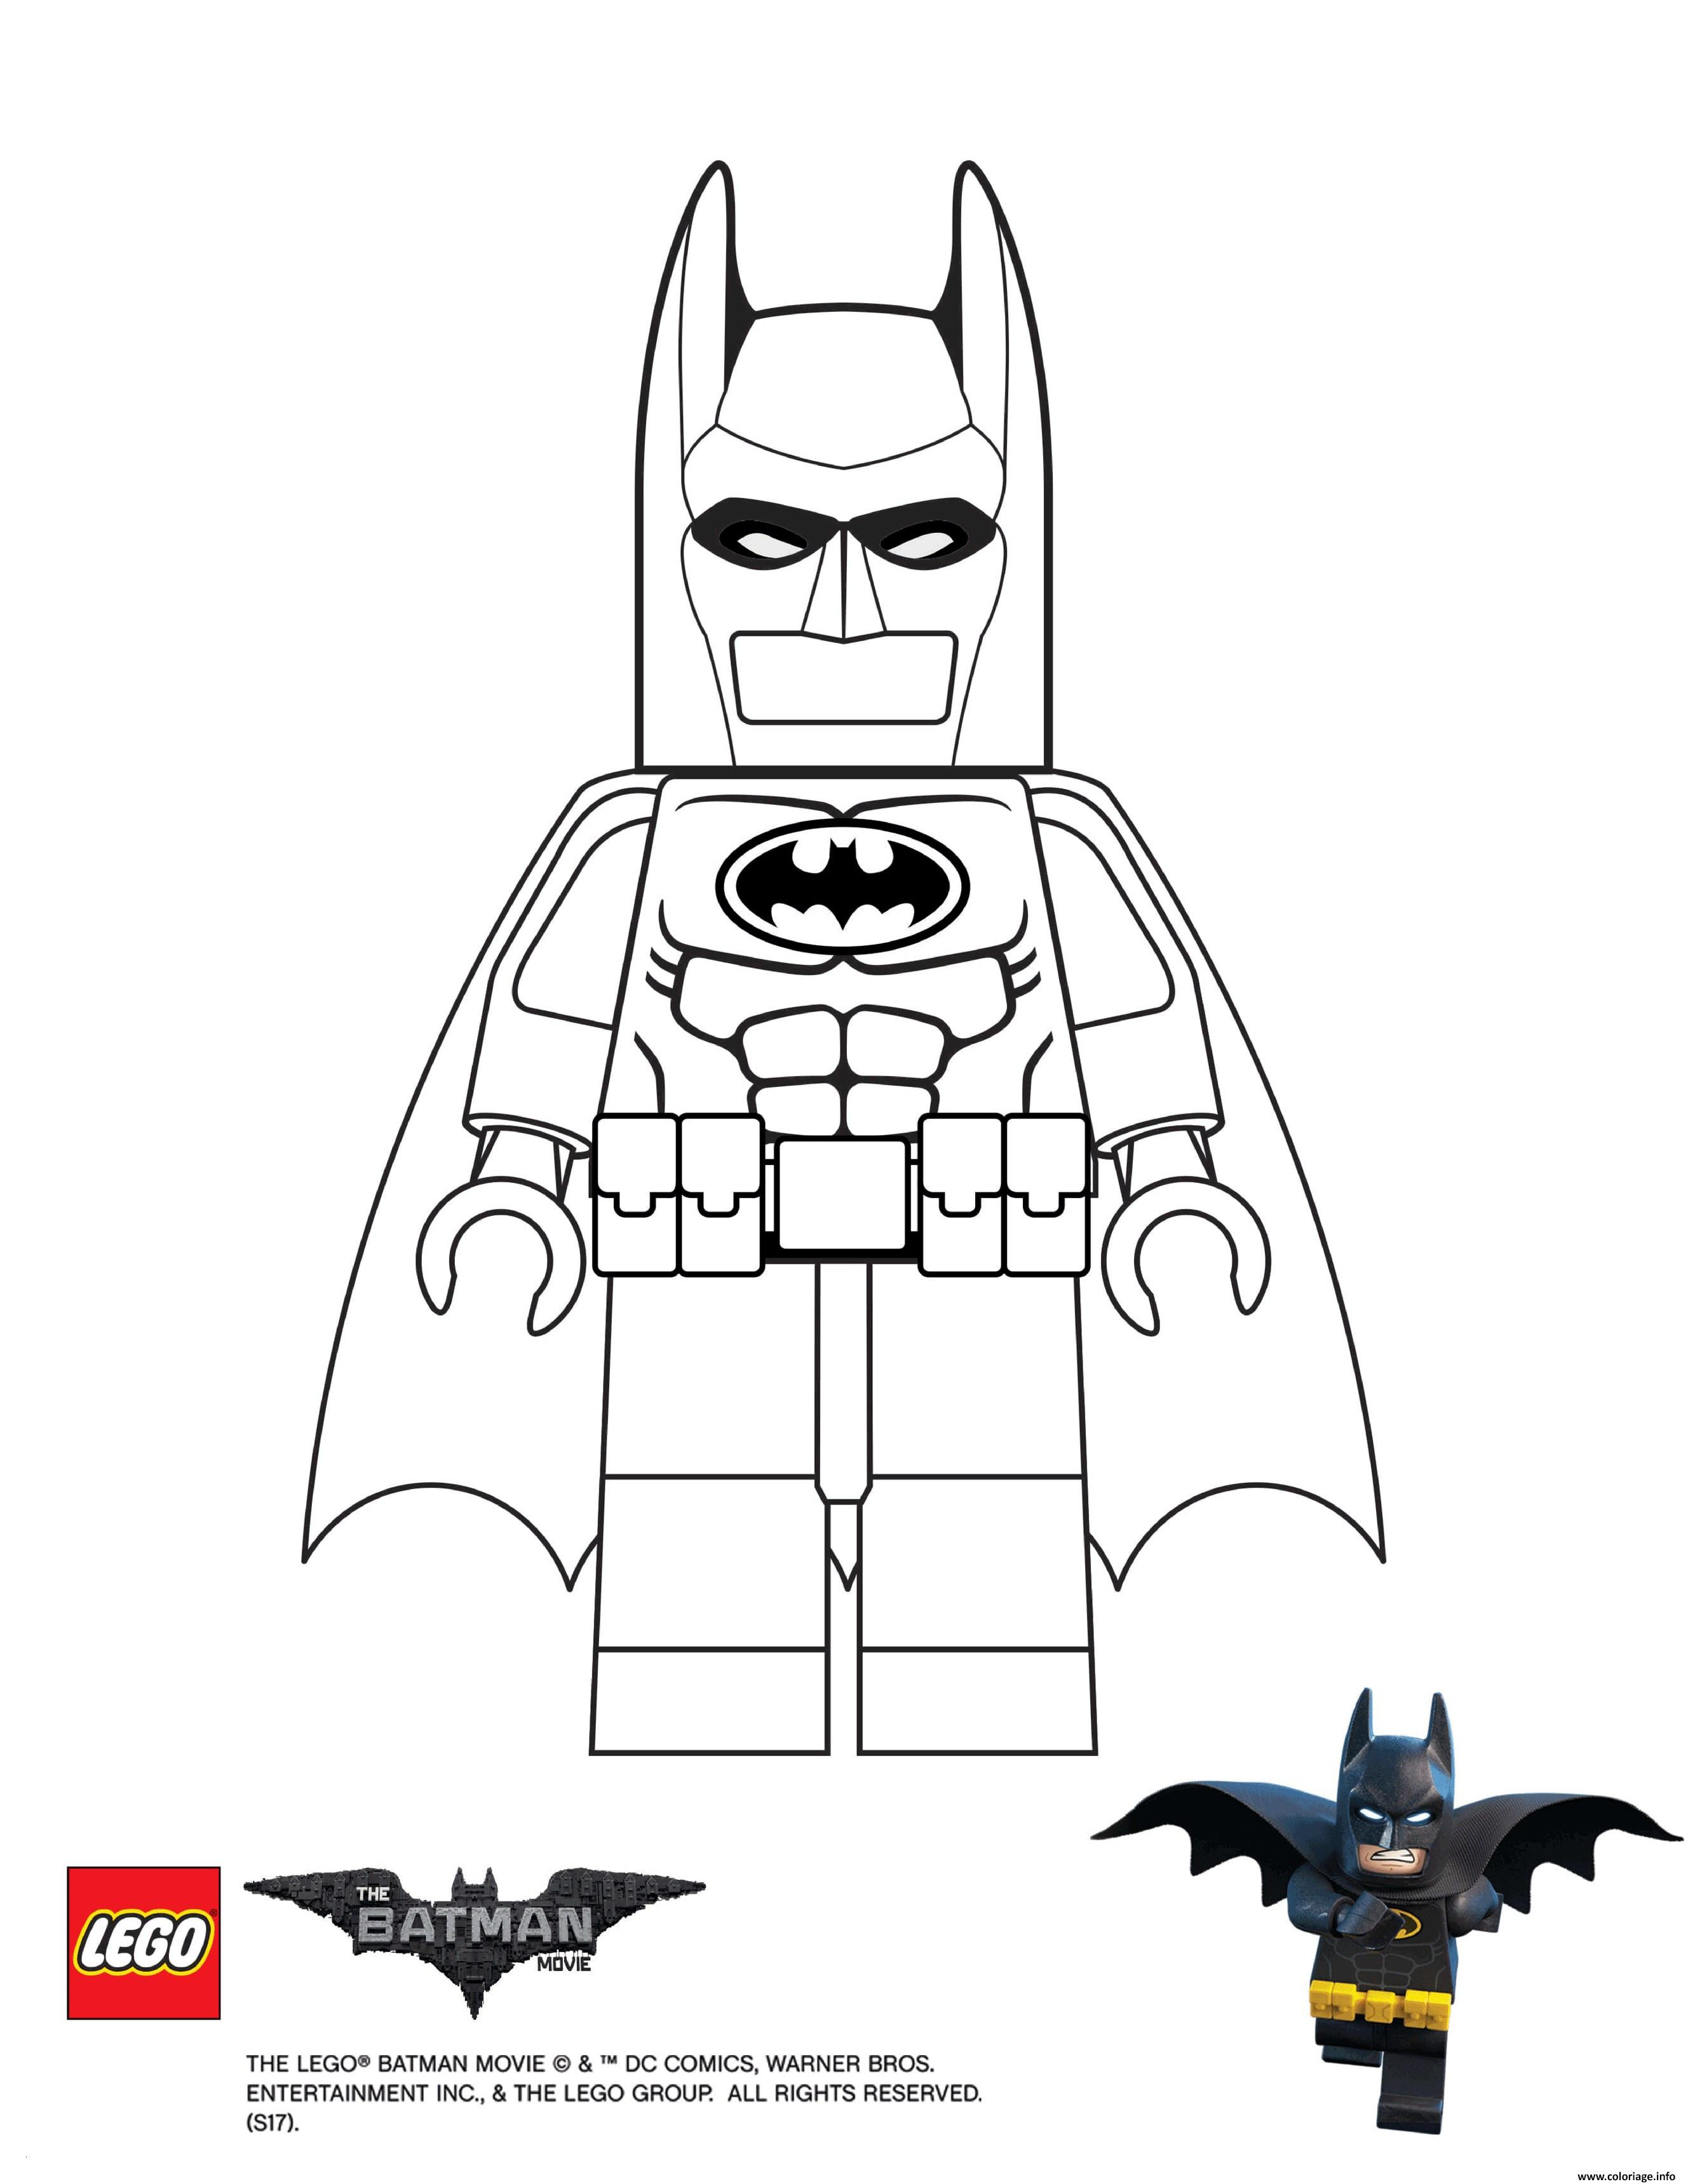 Ausmalbilder Lego Batman Inspirierend Ausmalbilder Lego Batman Beautiful 35 Ausmalbilder Lego Batman Bild